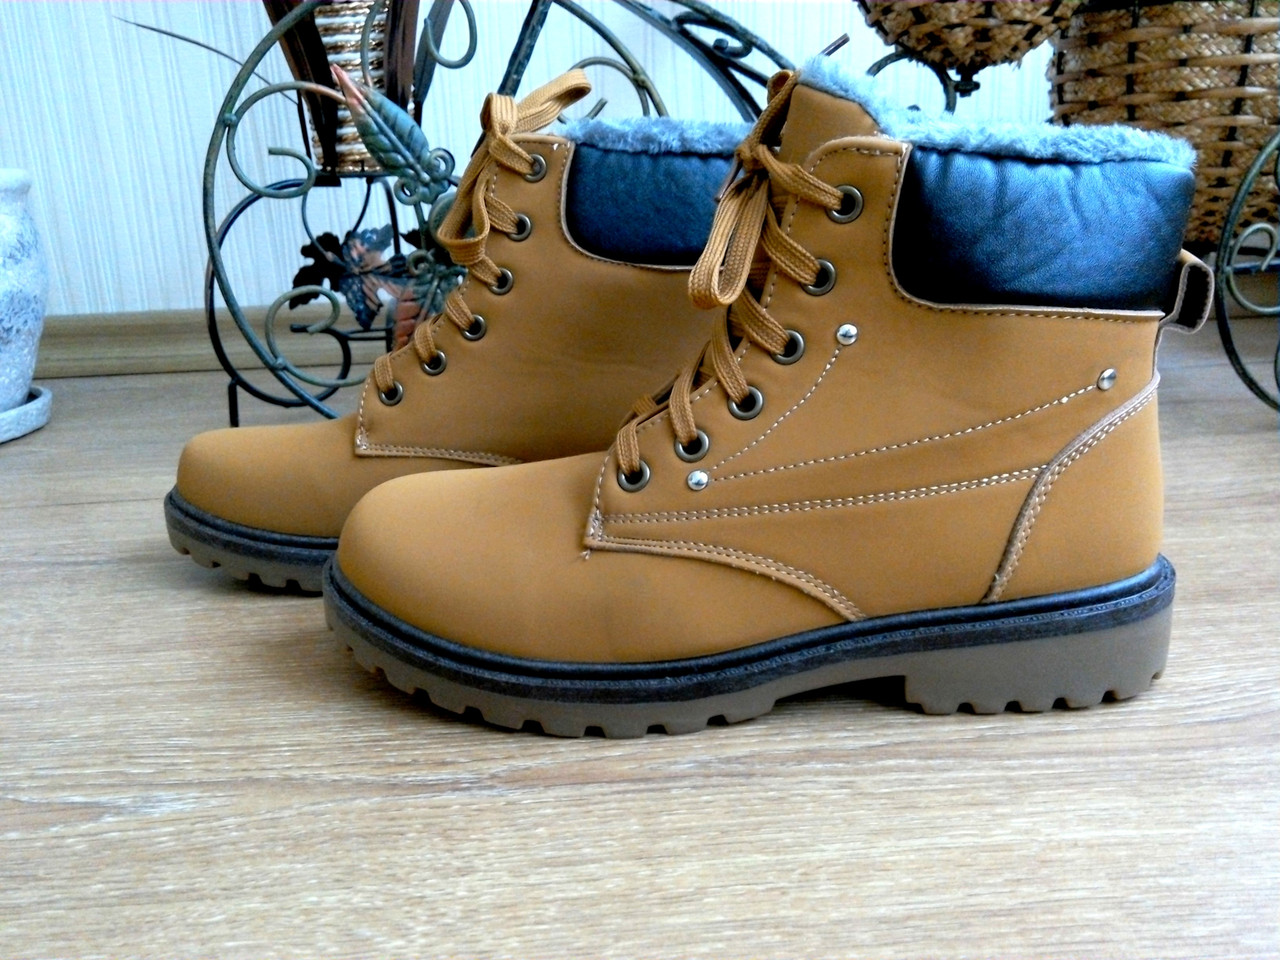 Мужские ботинки. Зимние ботинки. Стильные ботинки. Ботинки 2015